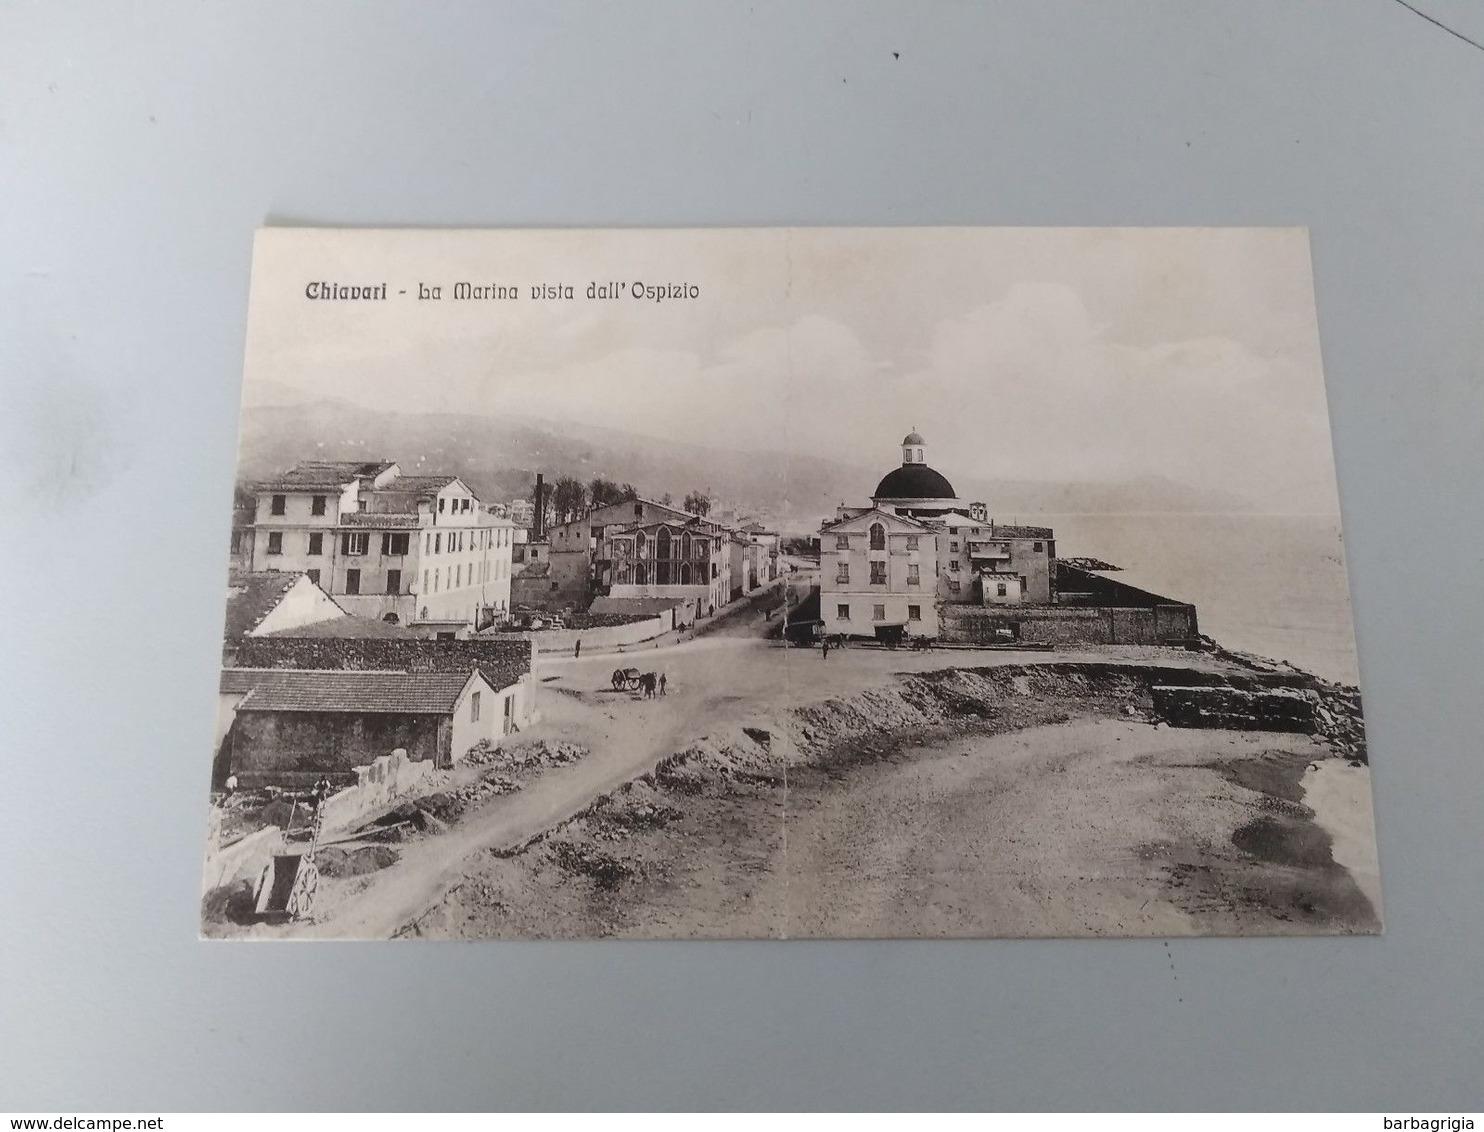 CARTOLINA CHIAVARI - LA MARINA VISTA DALL'OSPIZIO - Genova (Genoa)